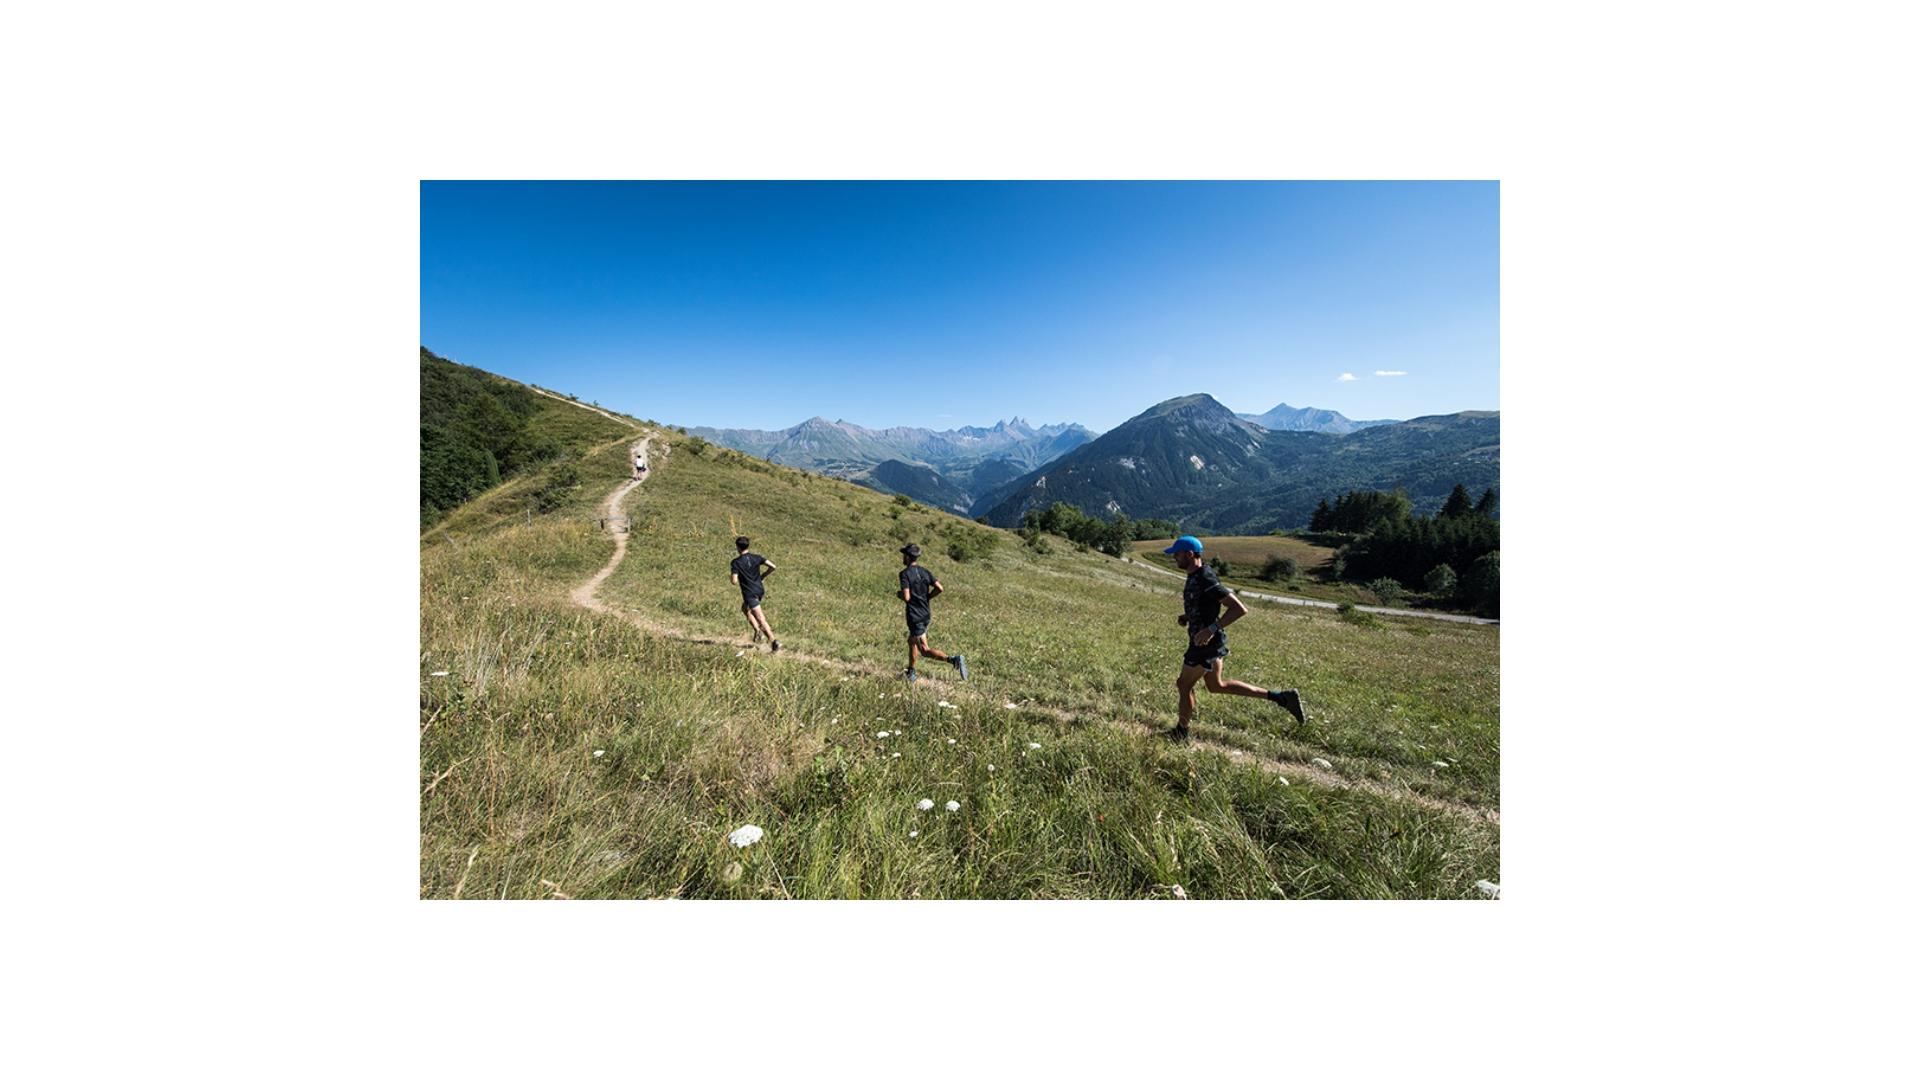 Semaine du trail - CGH Résidences